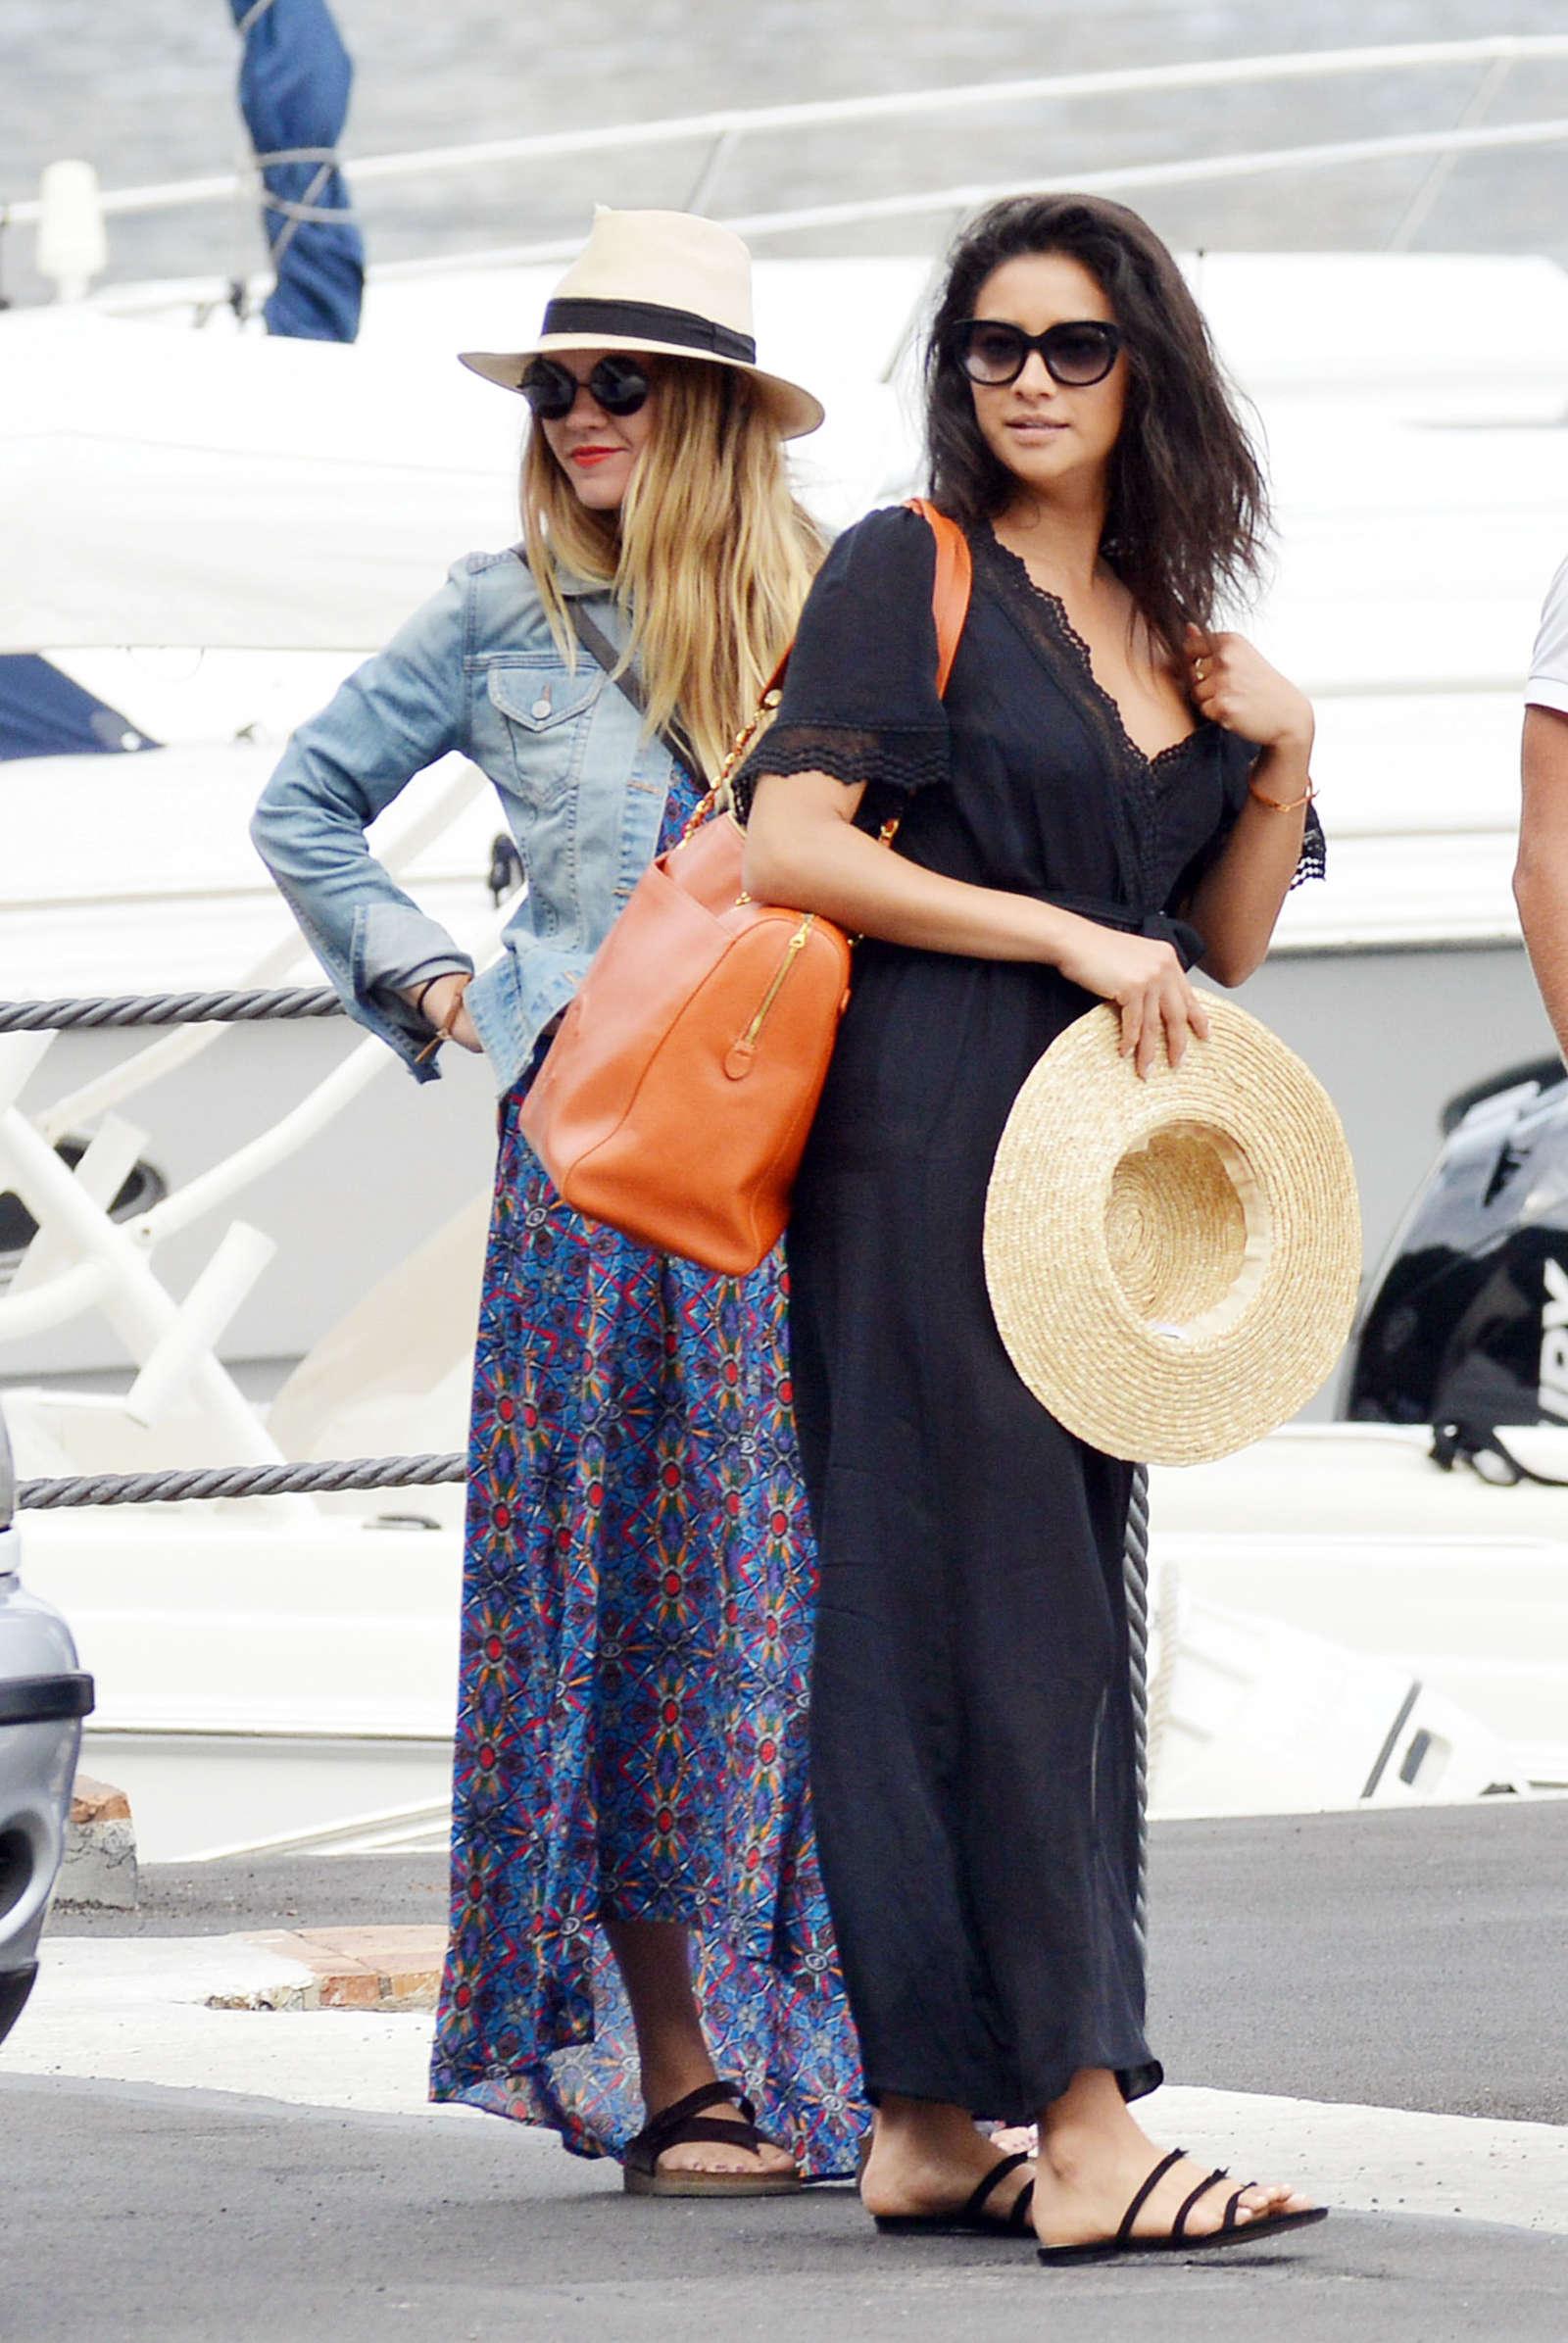 Ashley Benson 2016 : Ashley Benson, Shay Mitchell and Troian Bellisario on a boat in Capri -08